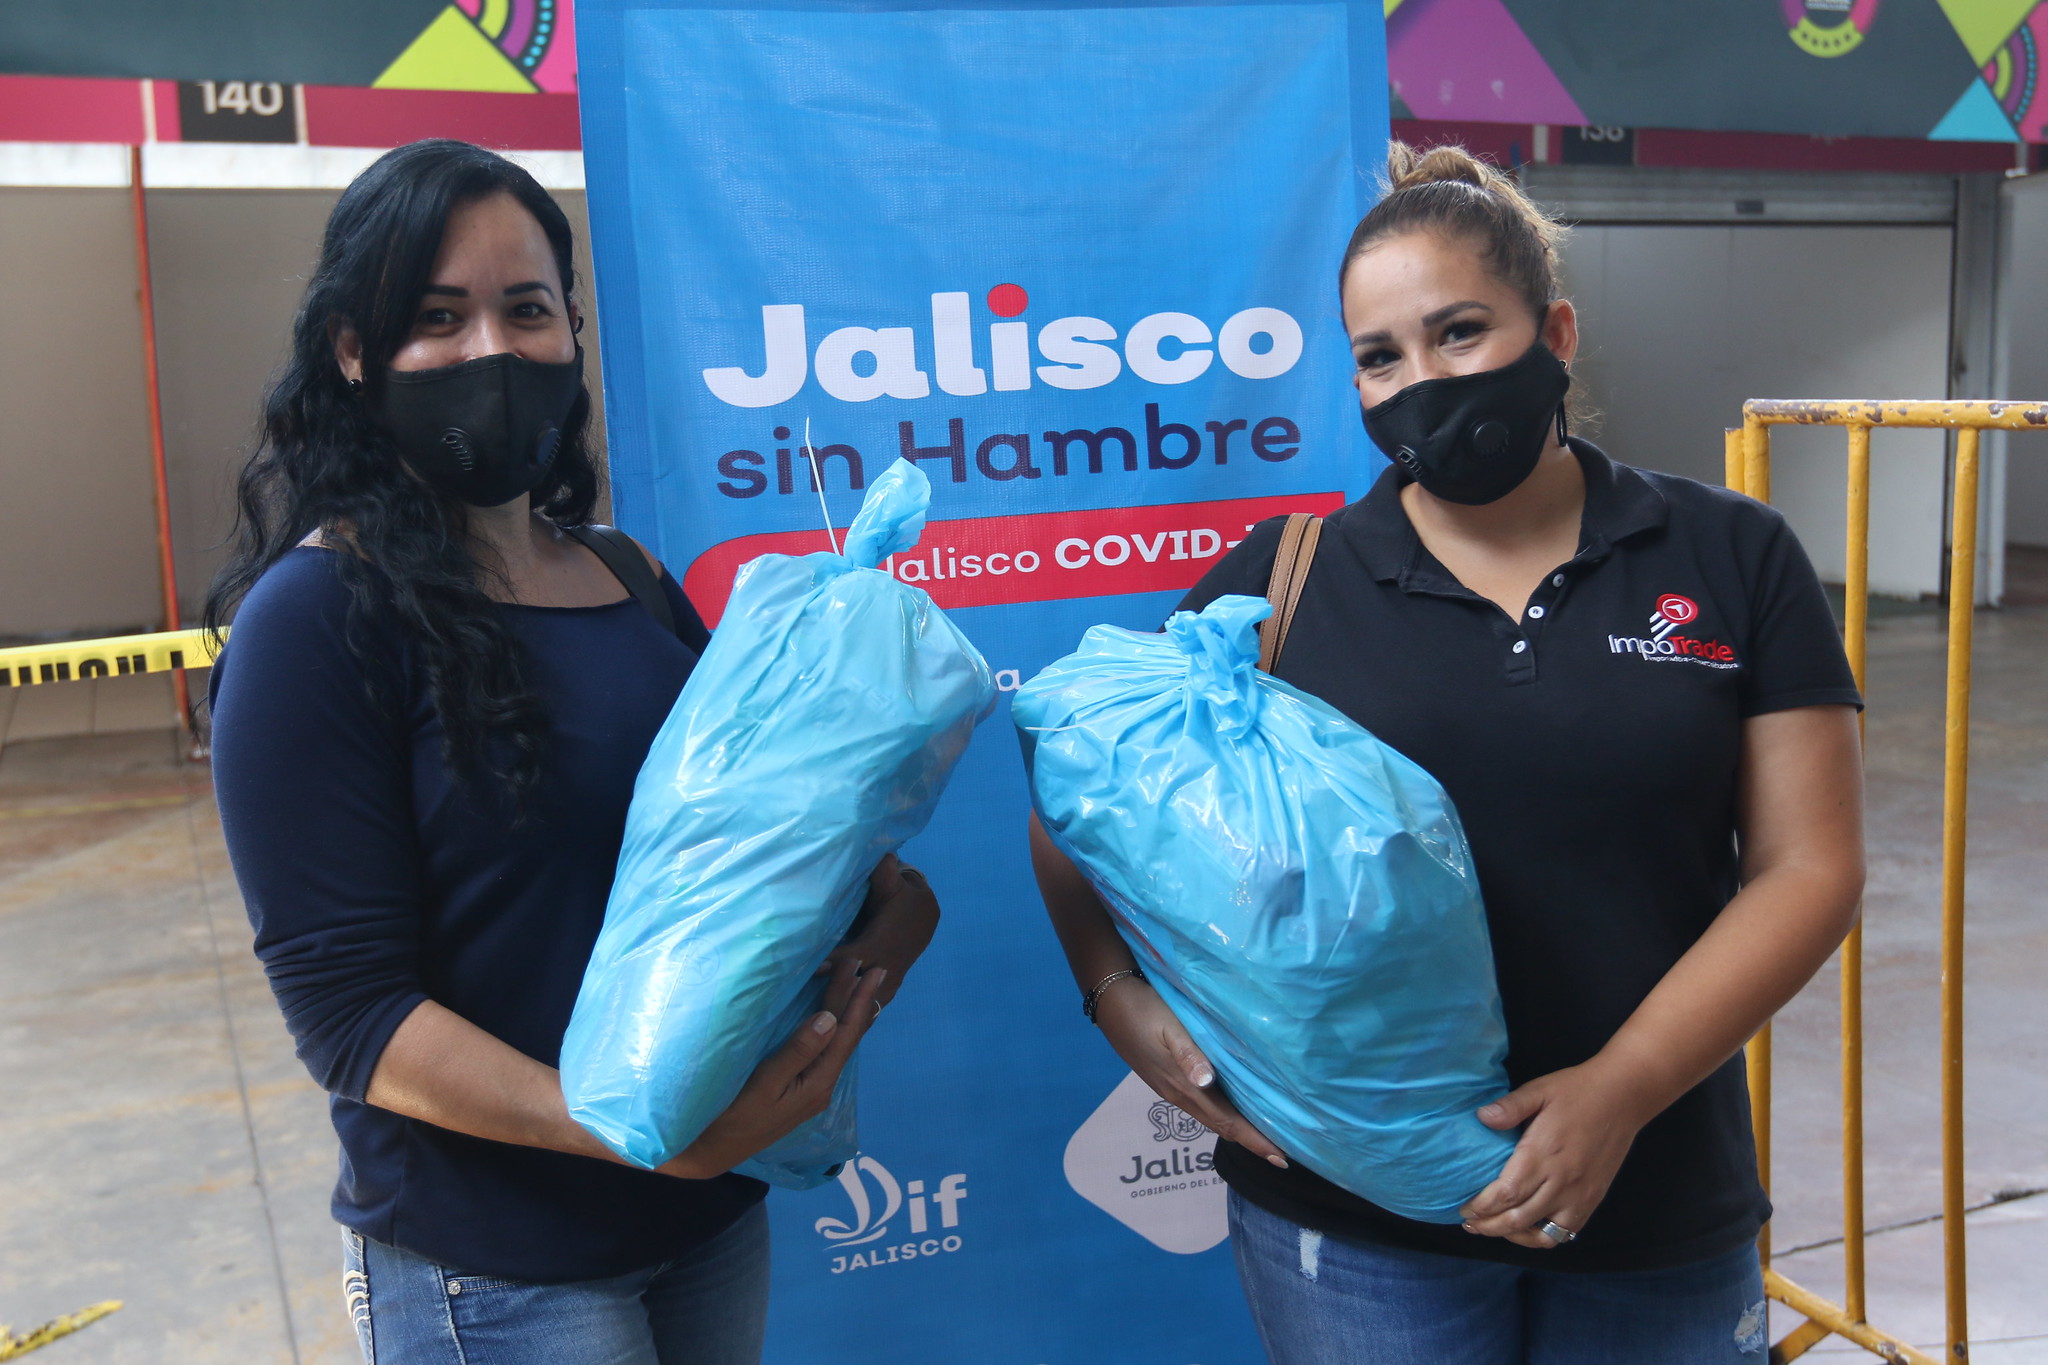 Esta semana DIF Jalisco benefició a más de 6 mil personas a través de Jalisco sin Hambre